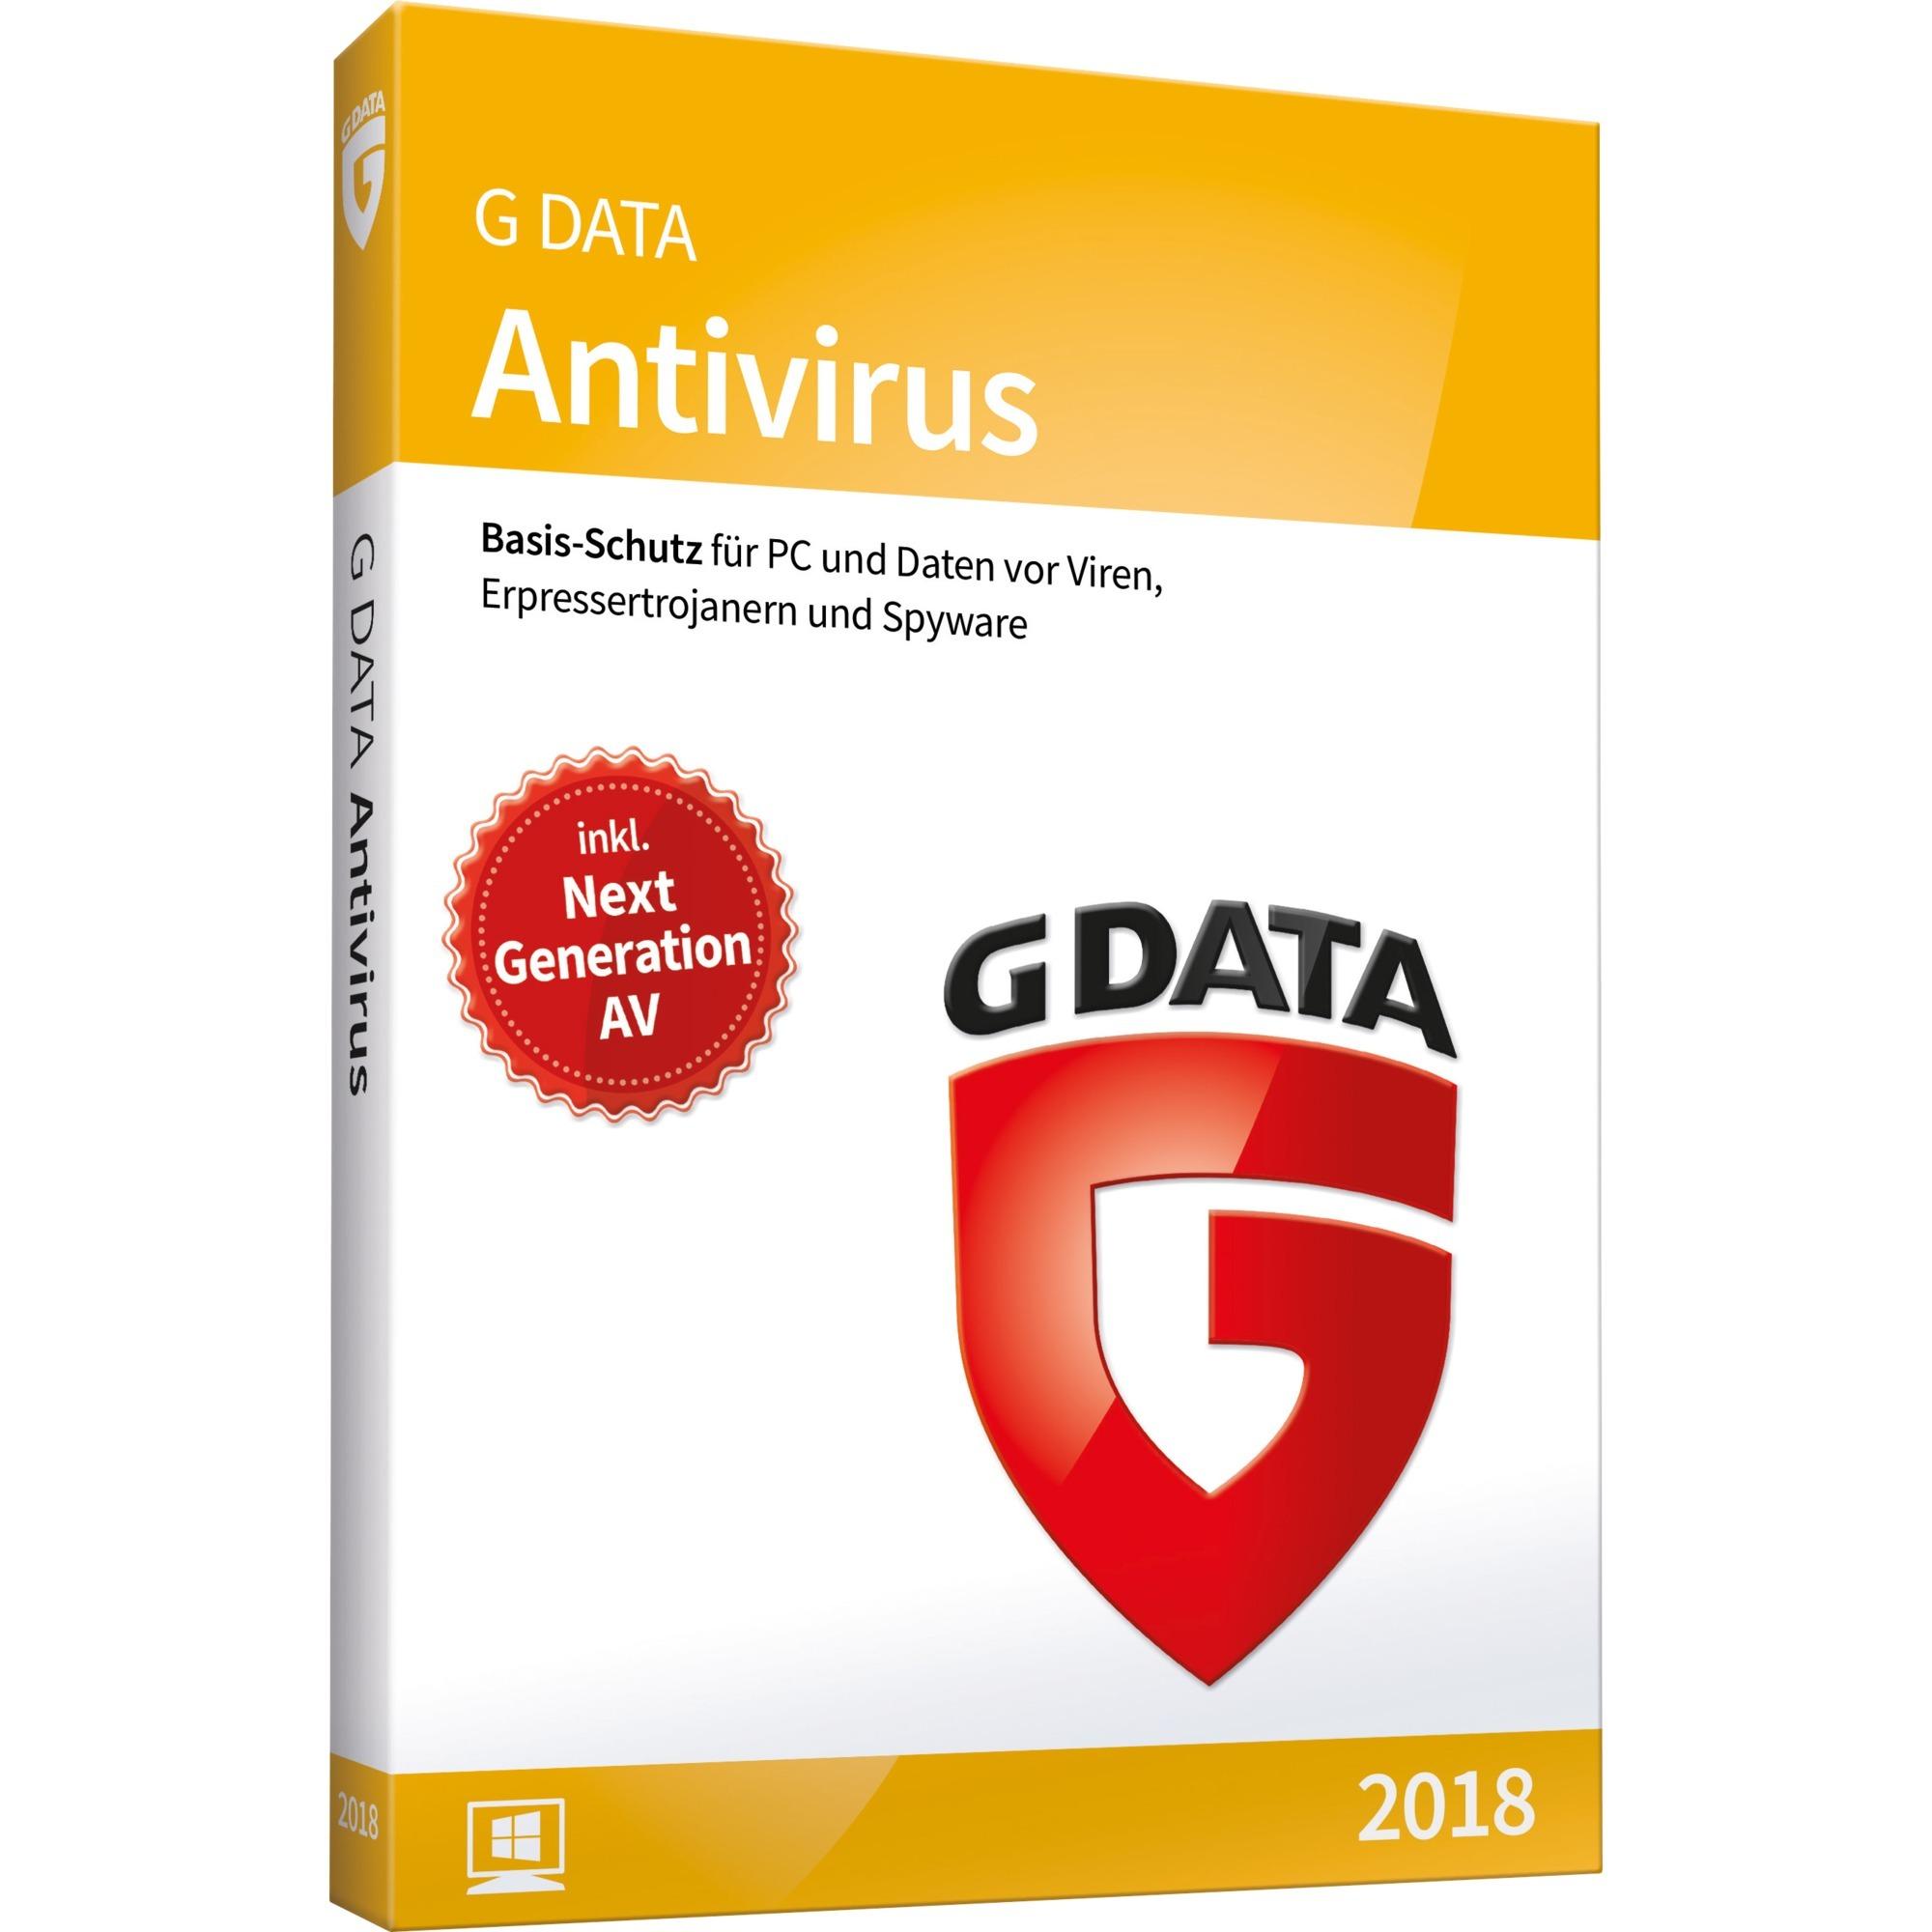 Antivirus 2018 1licencia(s) Caja Alemán, Software